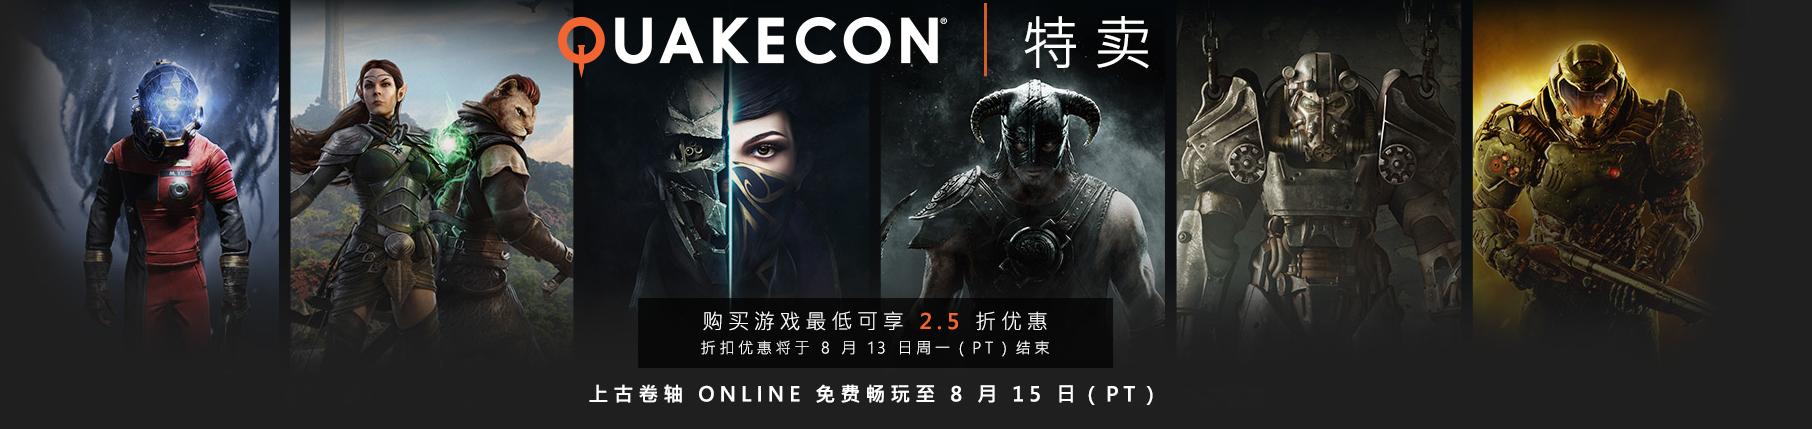 B社Quakecon 2018今日举行 旗下大作纷纷低价促销